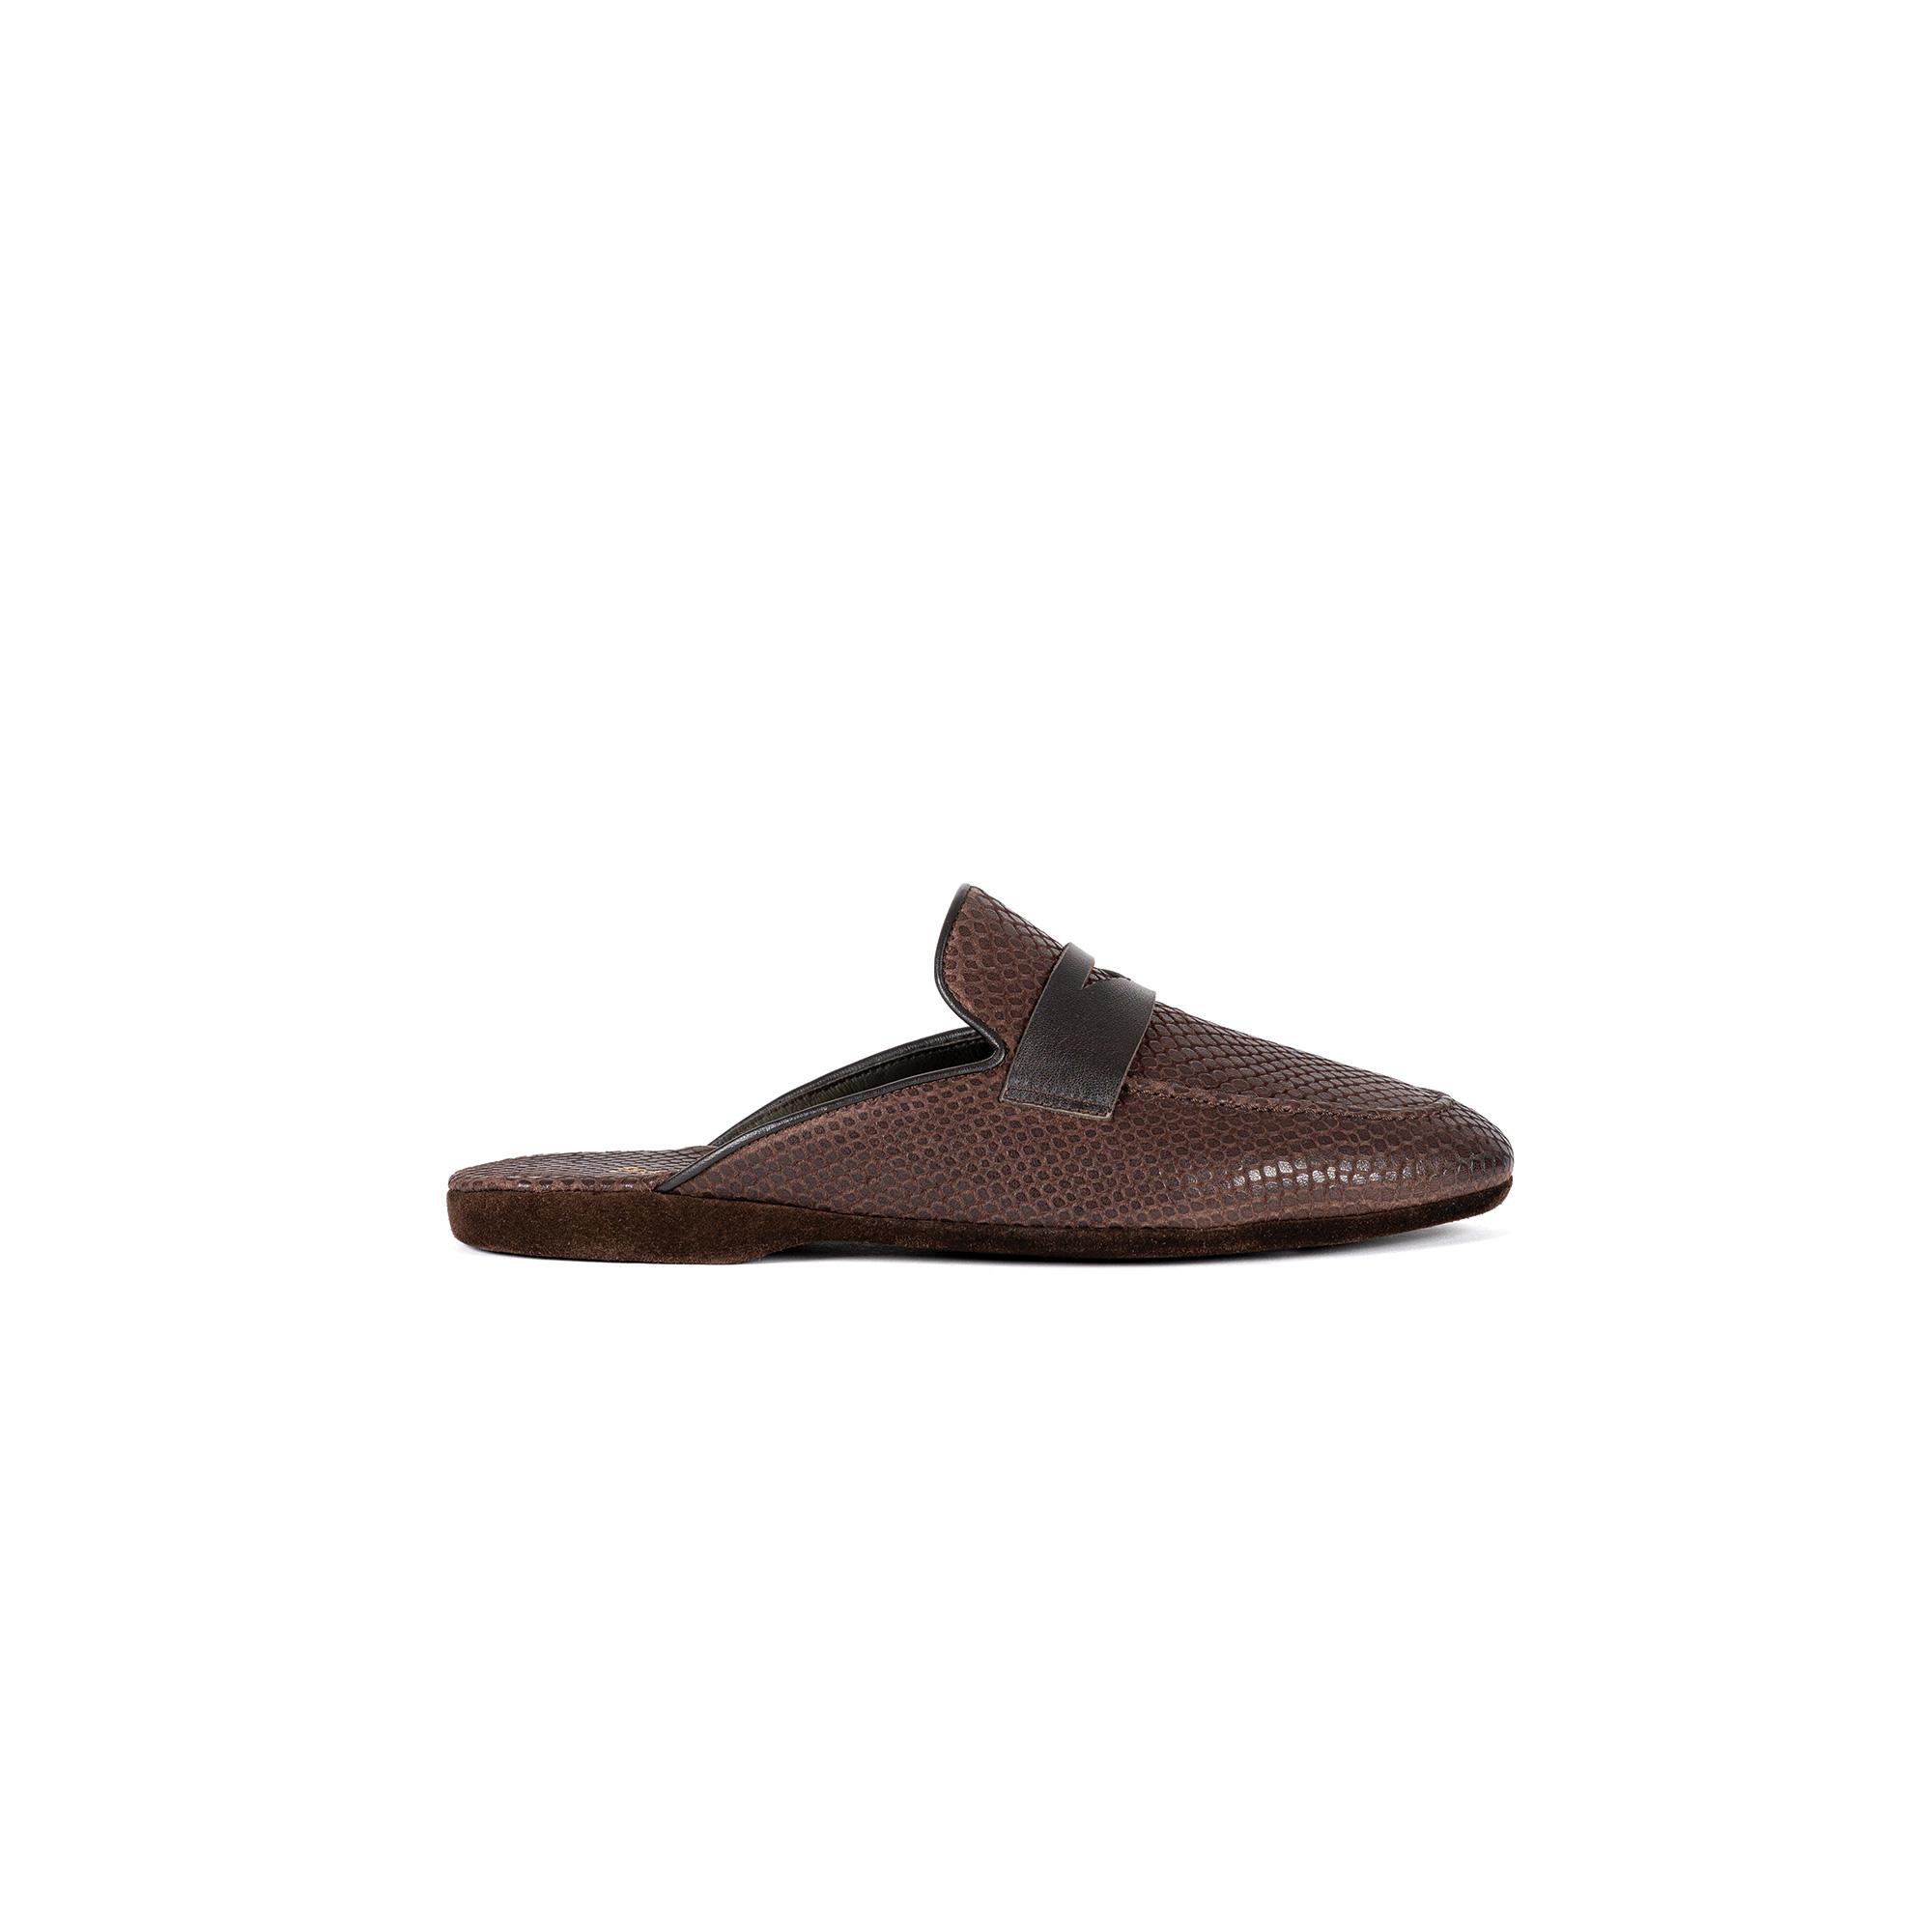 Indoor luxury slipper in brown exotic print leather - Farfalla italian slippers